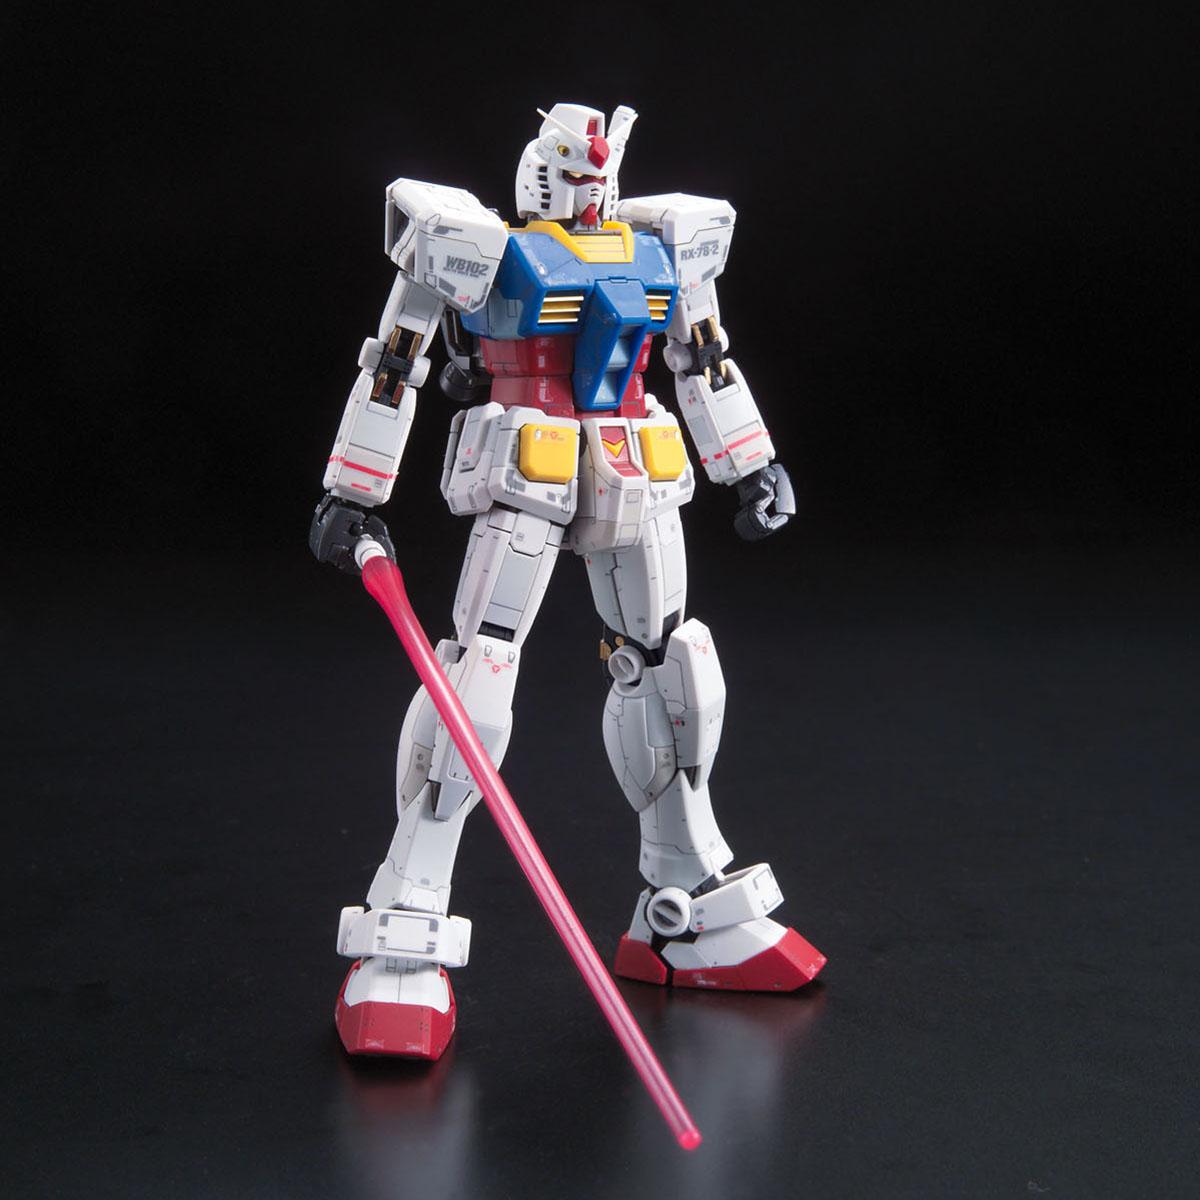 【現貨】BANDAI 1/144 RG #01 30週年 RX-78-2 鋼彈